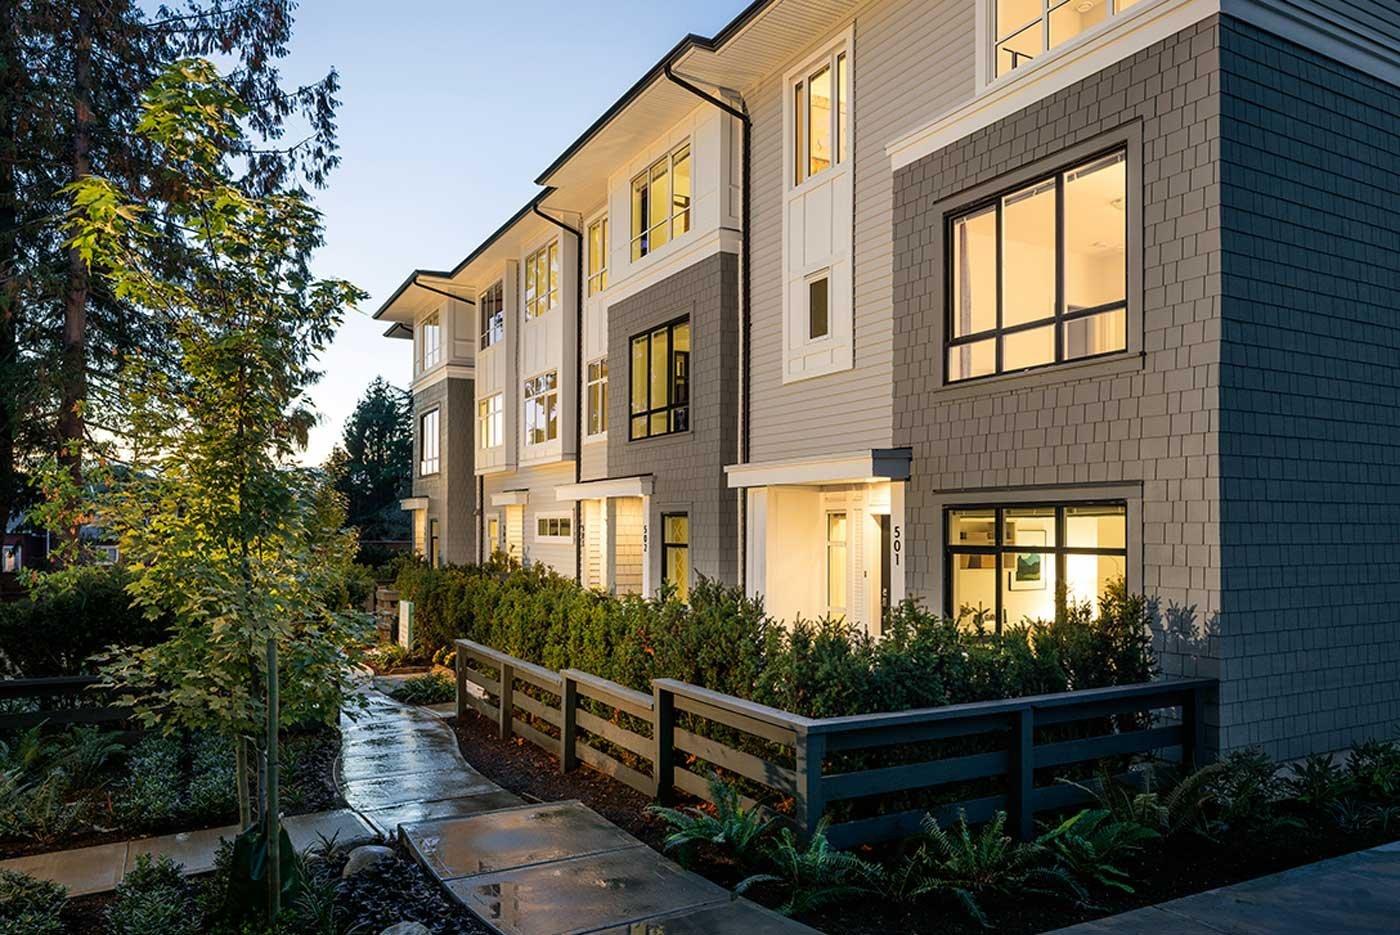 Exterior - 18505 Laurensen Place, Surrey, BC V4N 6R7, Canada!